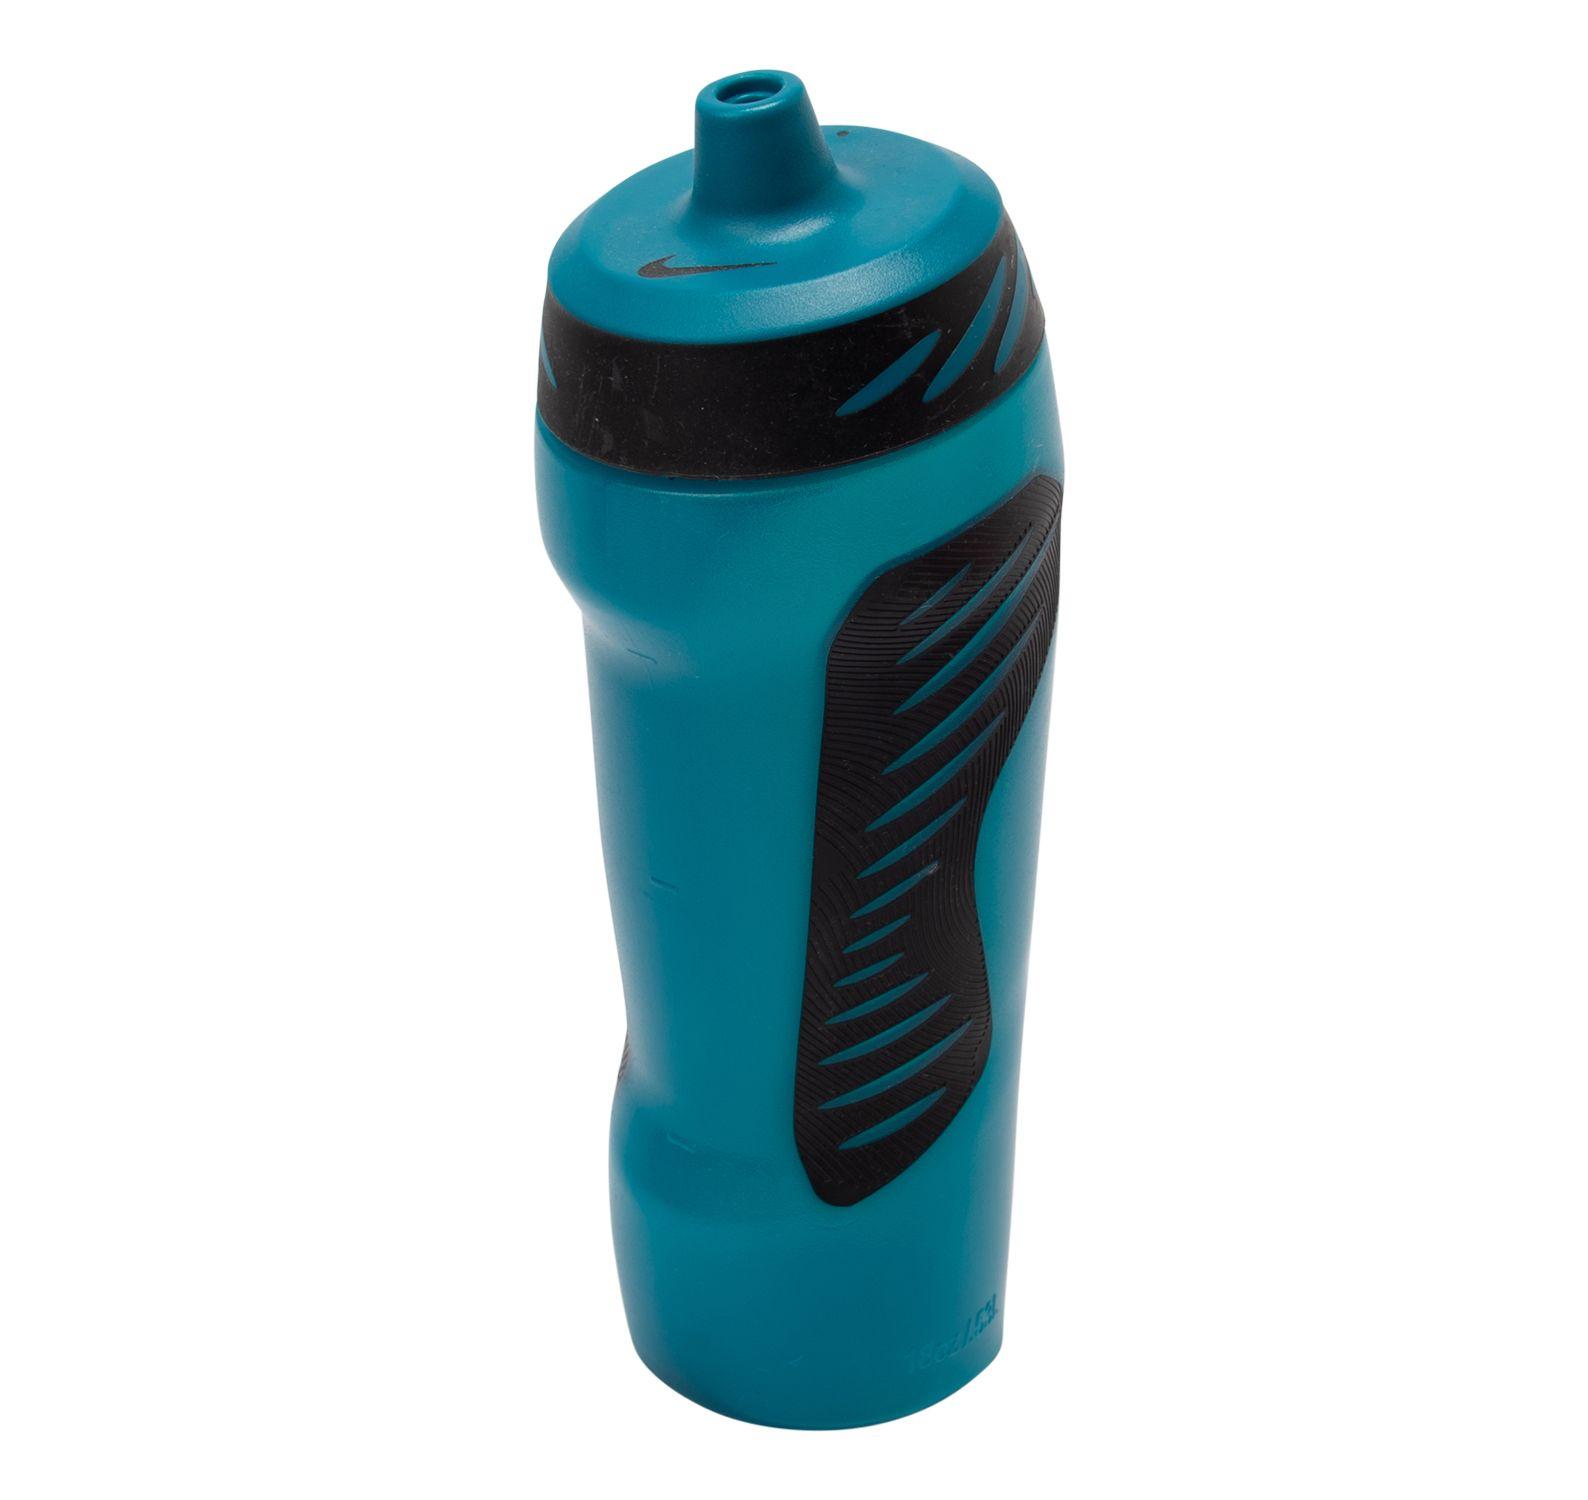 Nike Hyperfuel Water Bottle 18, Blustery/Black/White, 500, Nike